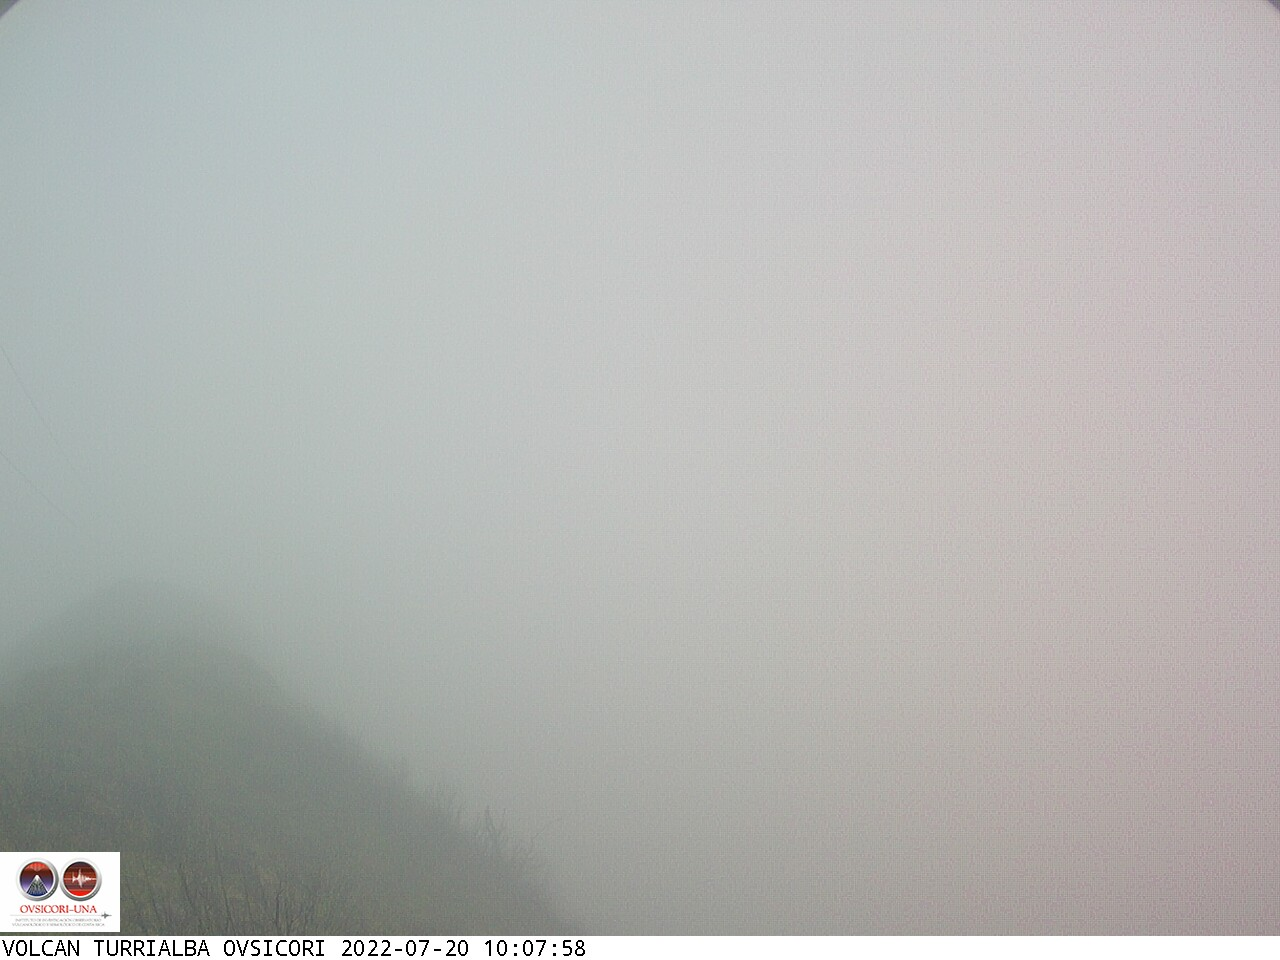 Volcano Turrialba Sun. 10:08